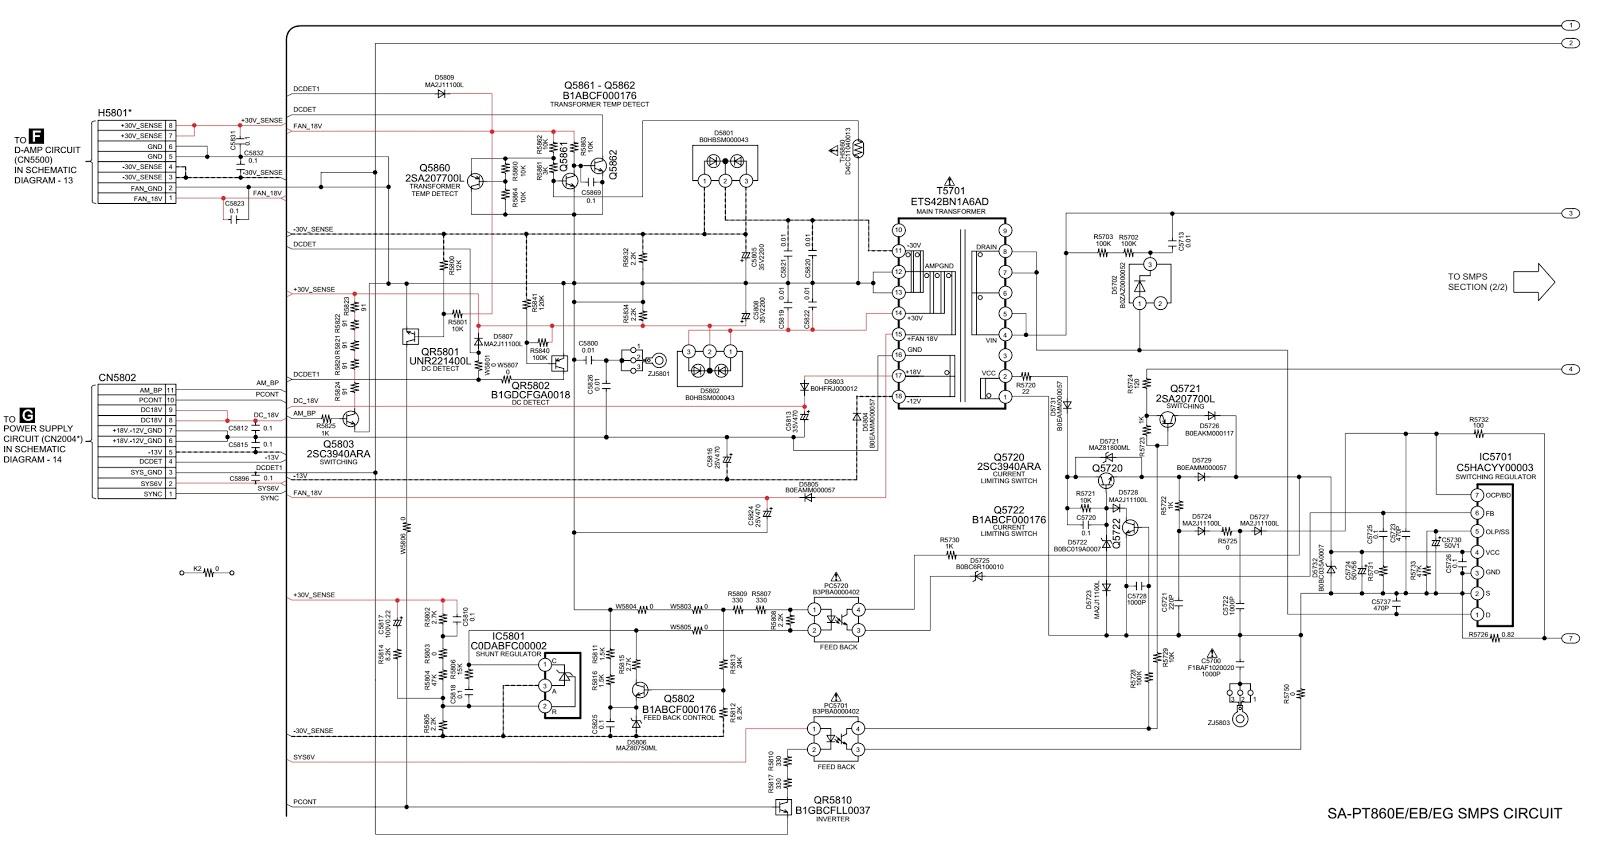 Panasonic Hts Sa Pt860e Smps And Amplifier Circuit Diagram